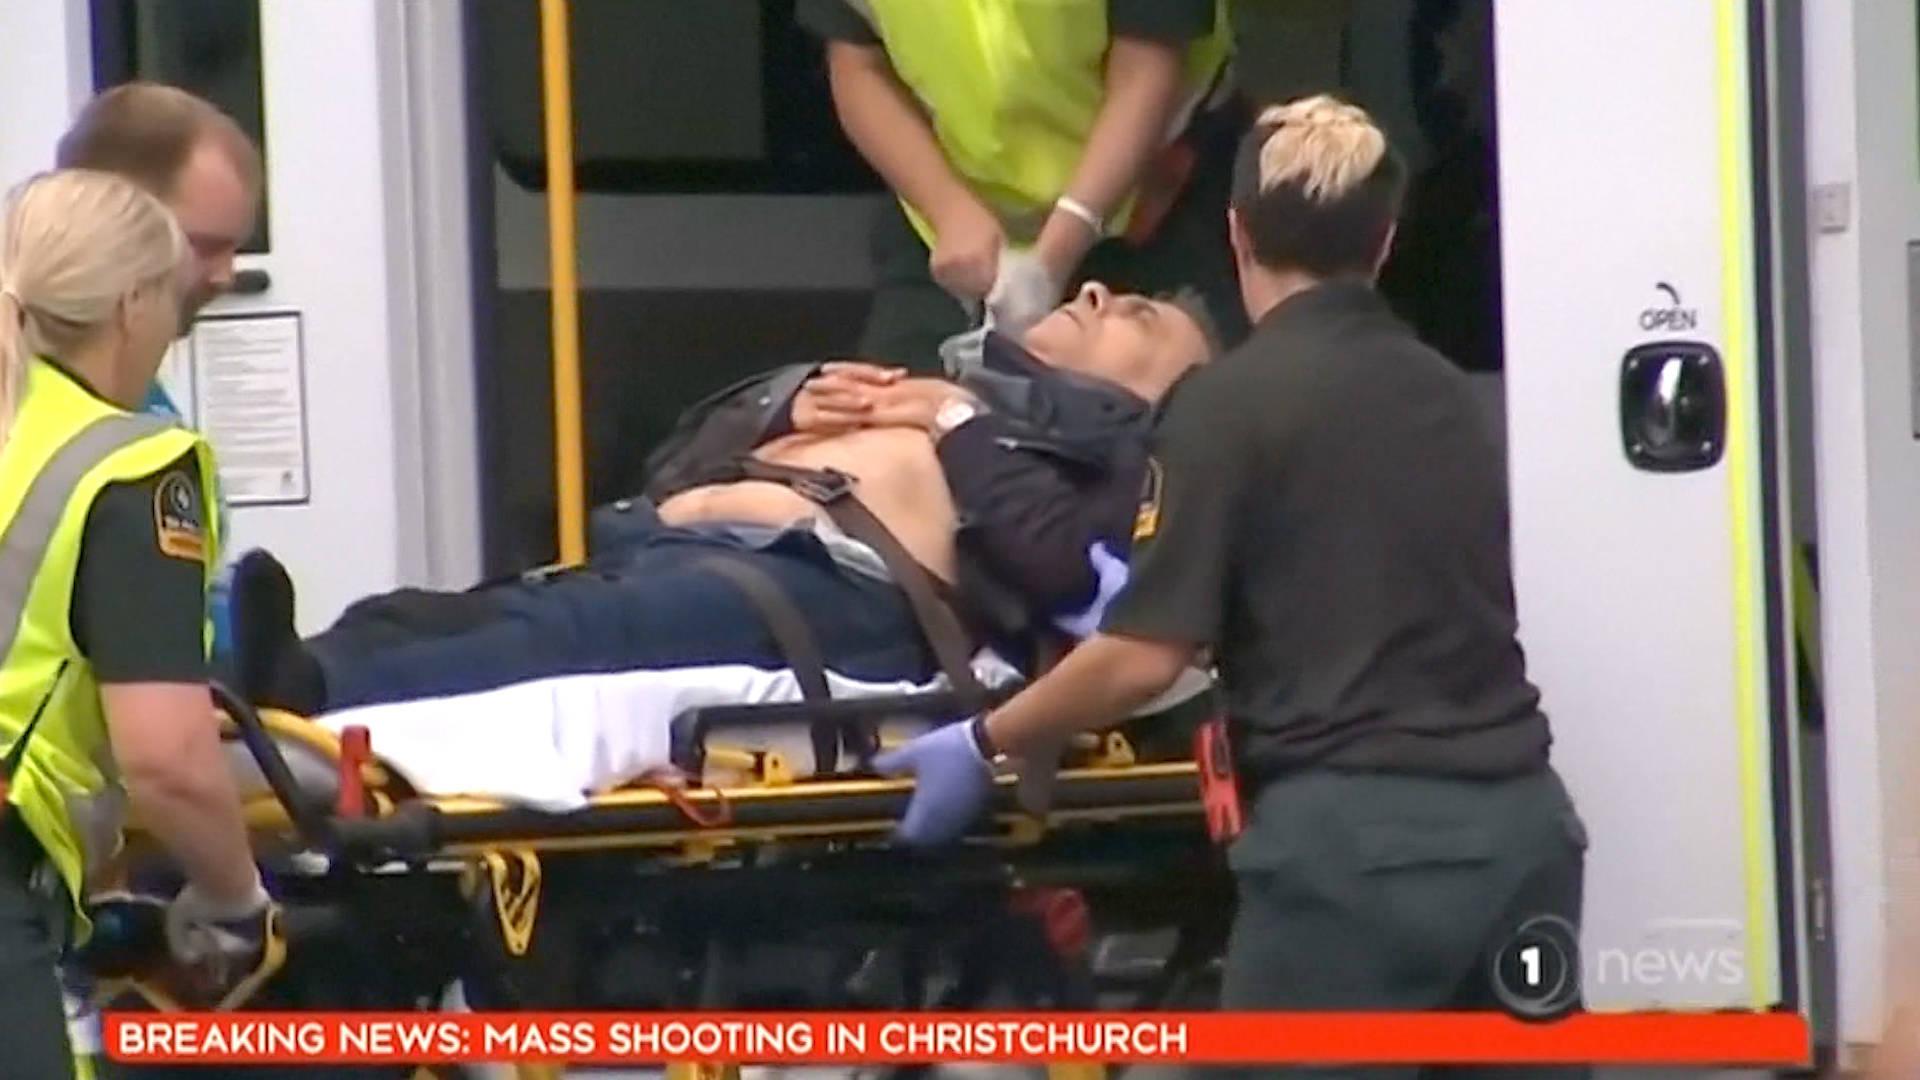 Nz Shooting Mosque Hd: 49 Dead As Far-Right Shooter Opens Fire On New Zealand